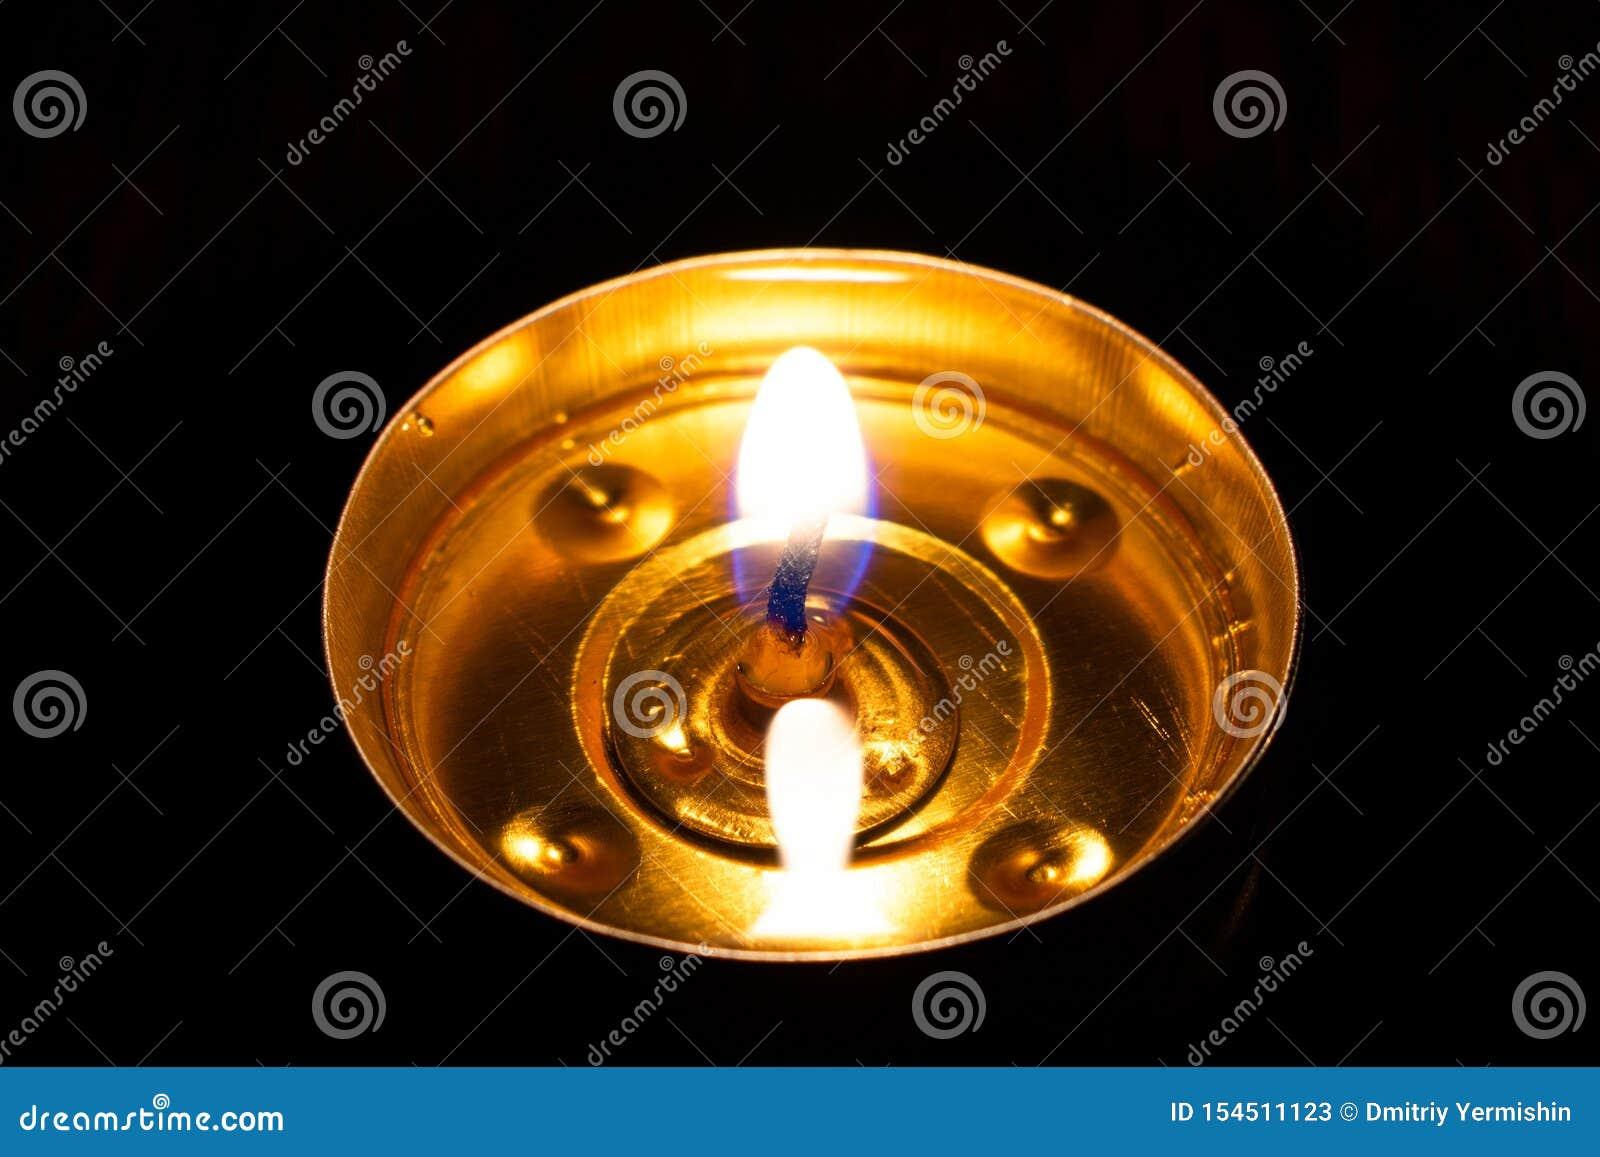 Candle Burning In The Black Background Stock Image - Image ...